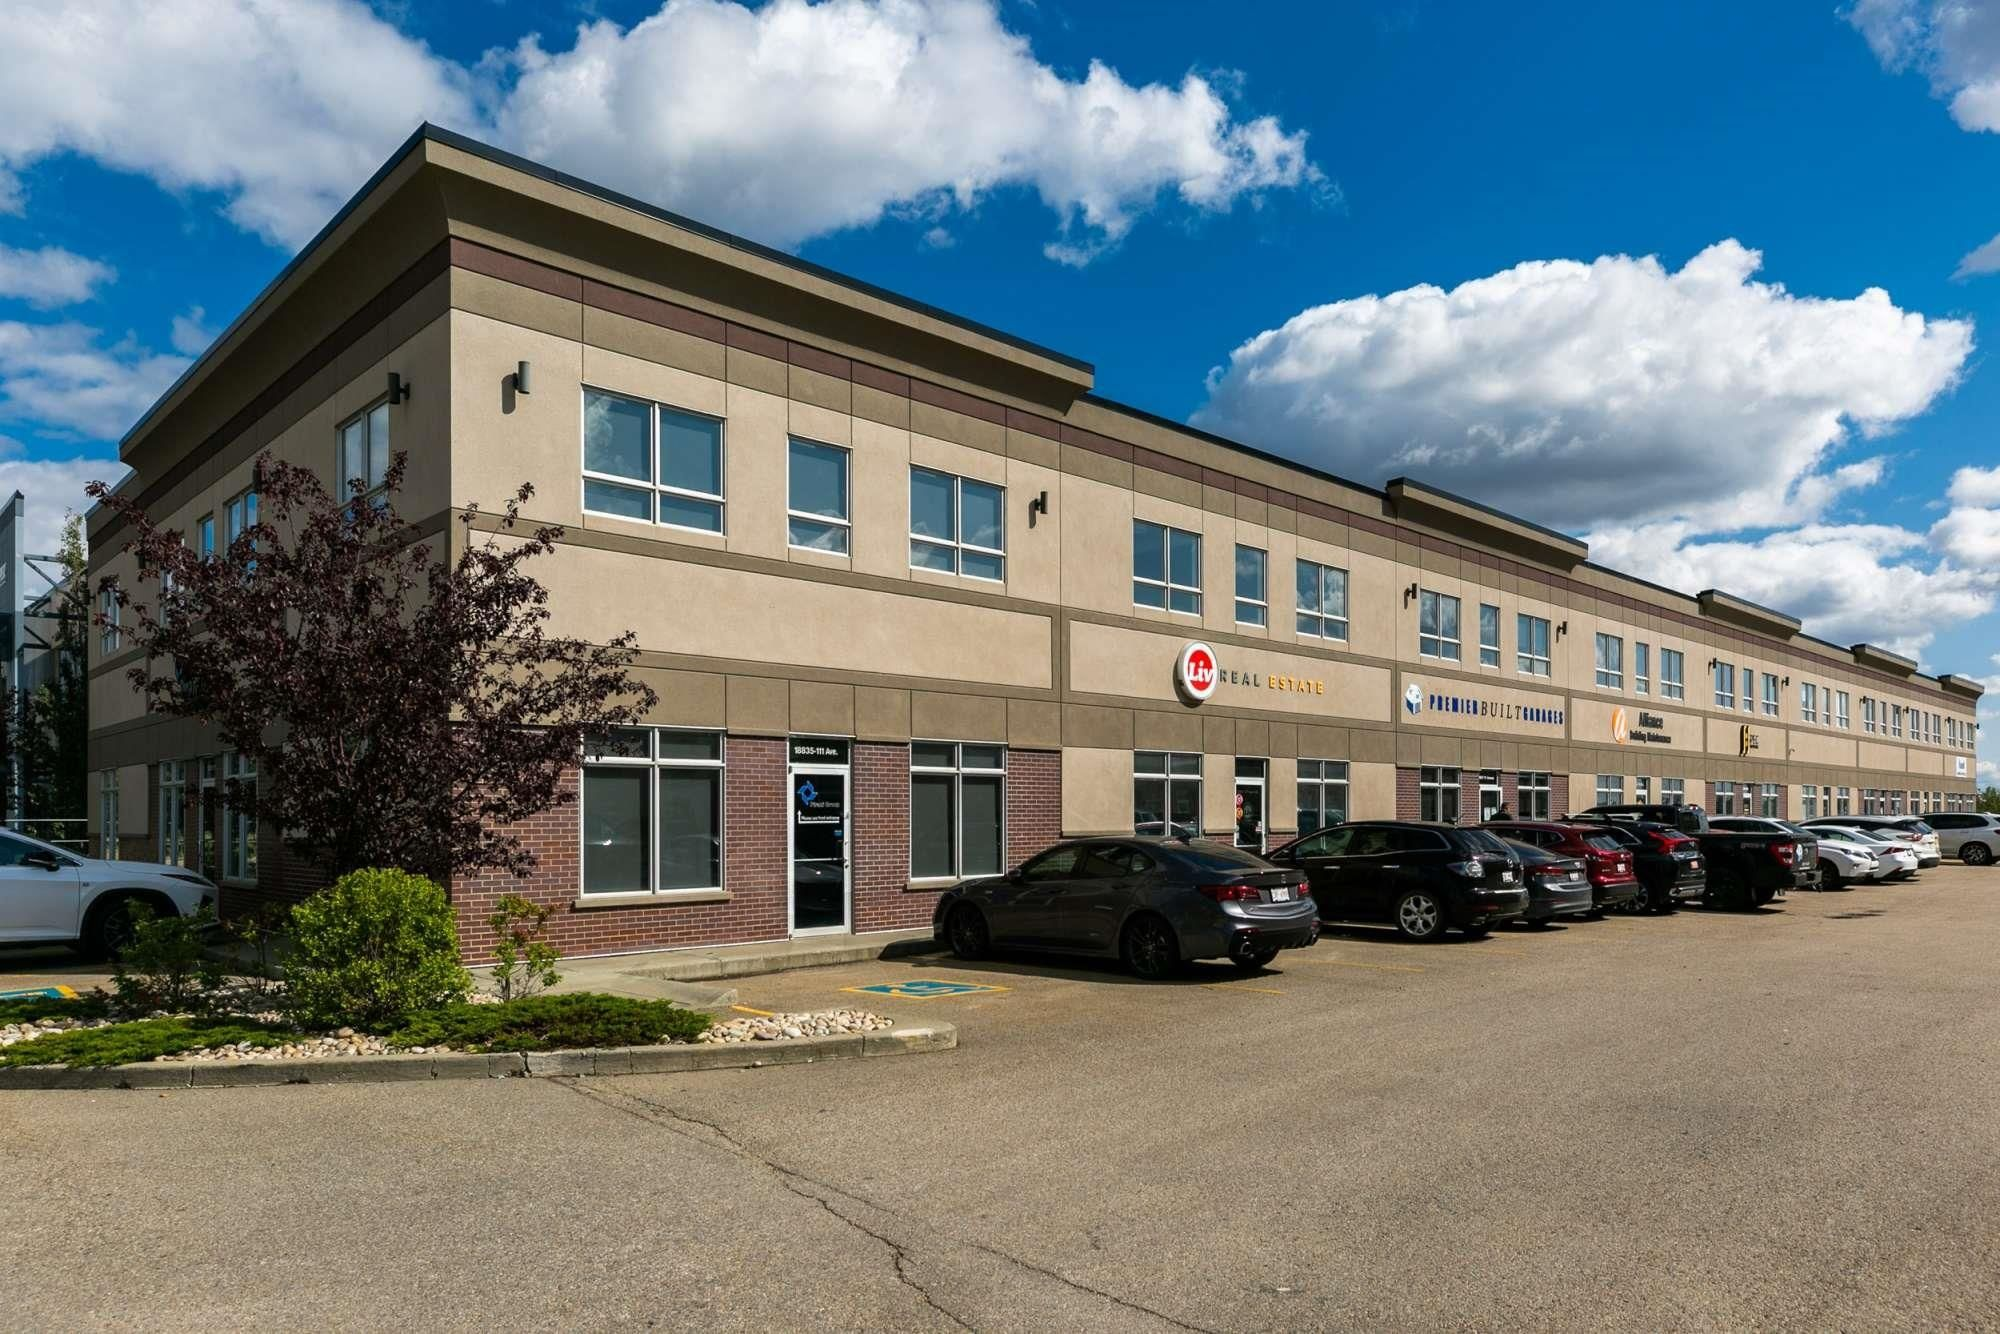 Main Photo: 18827 111 Avenue in Edmonton: Zone 40 Office for lease : MLS®# E4263796